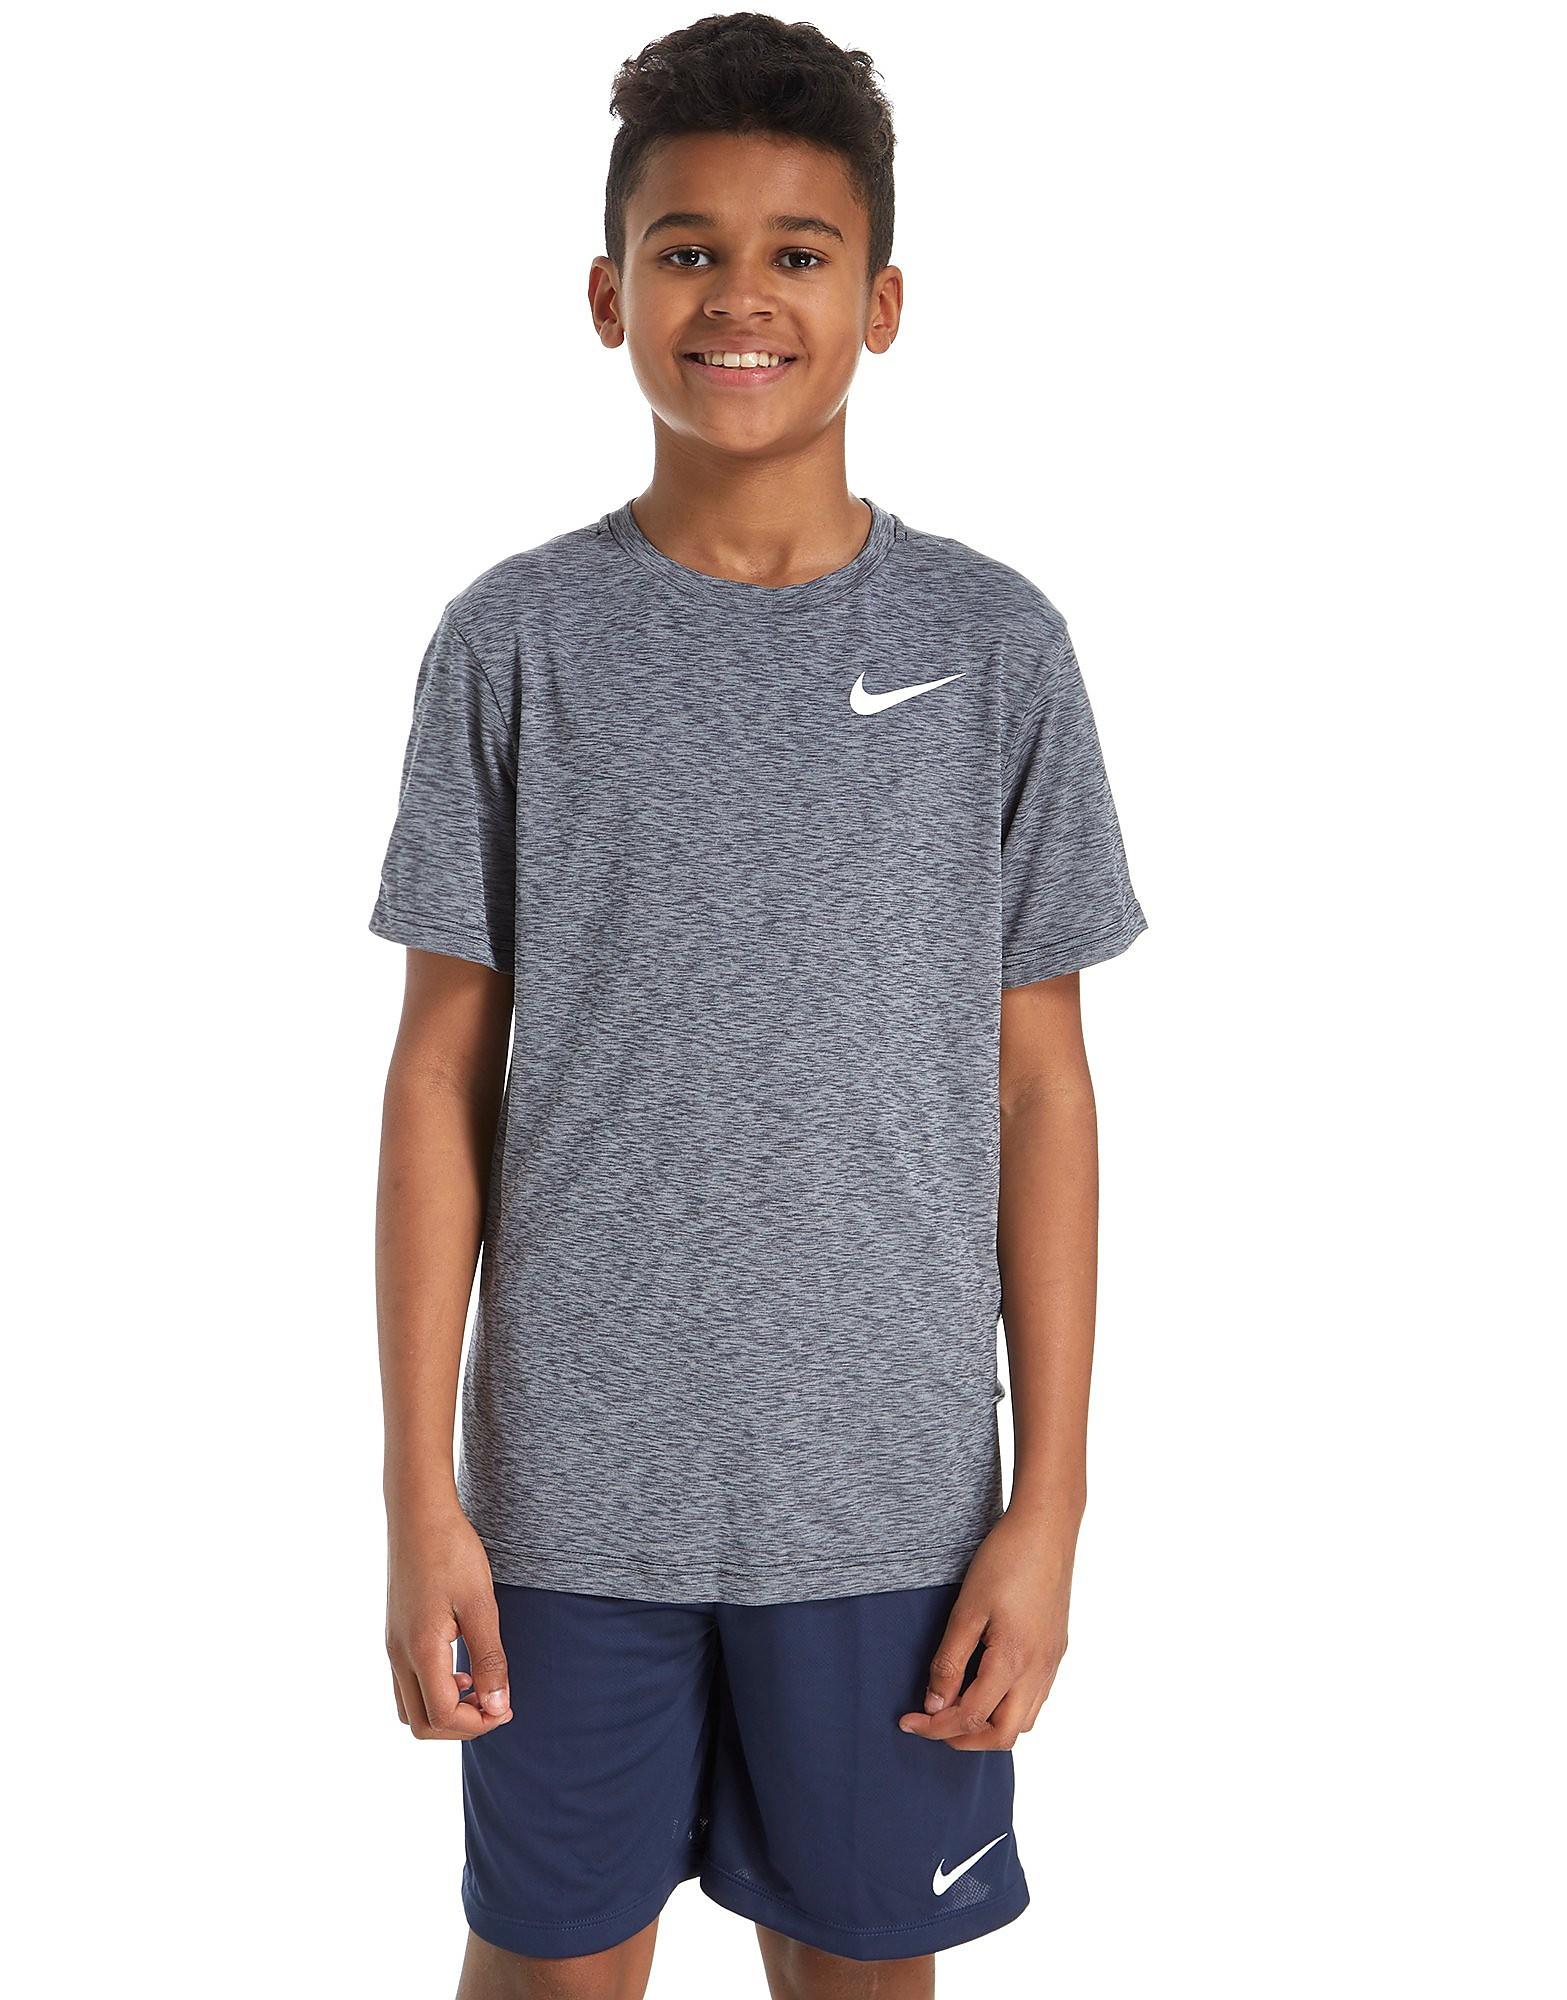 Nike Dri-FIT T-Shirt Junior